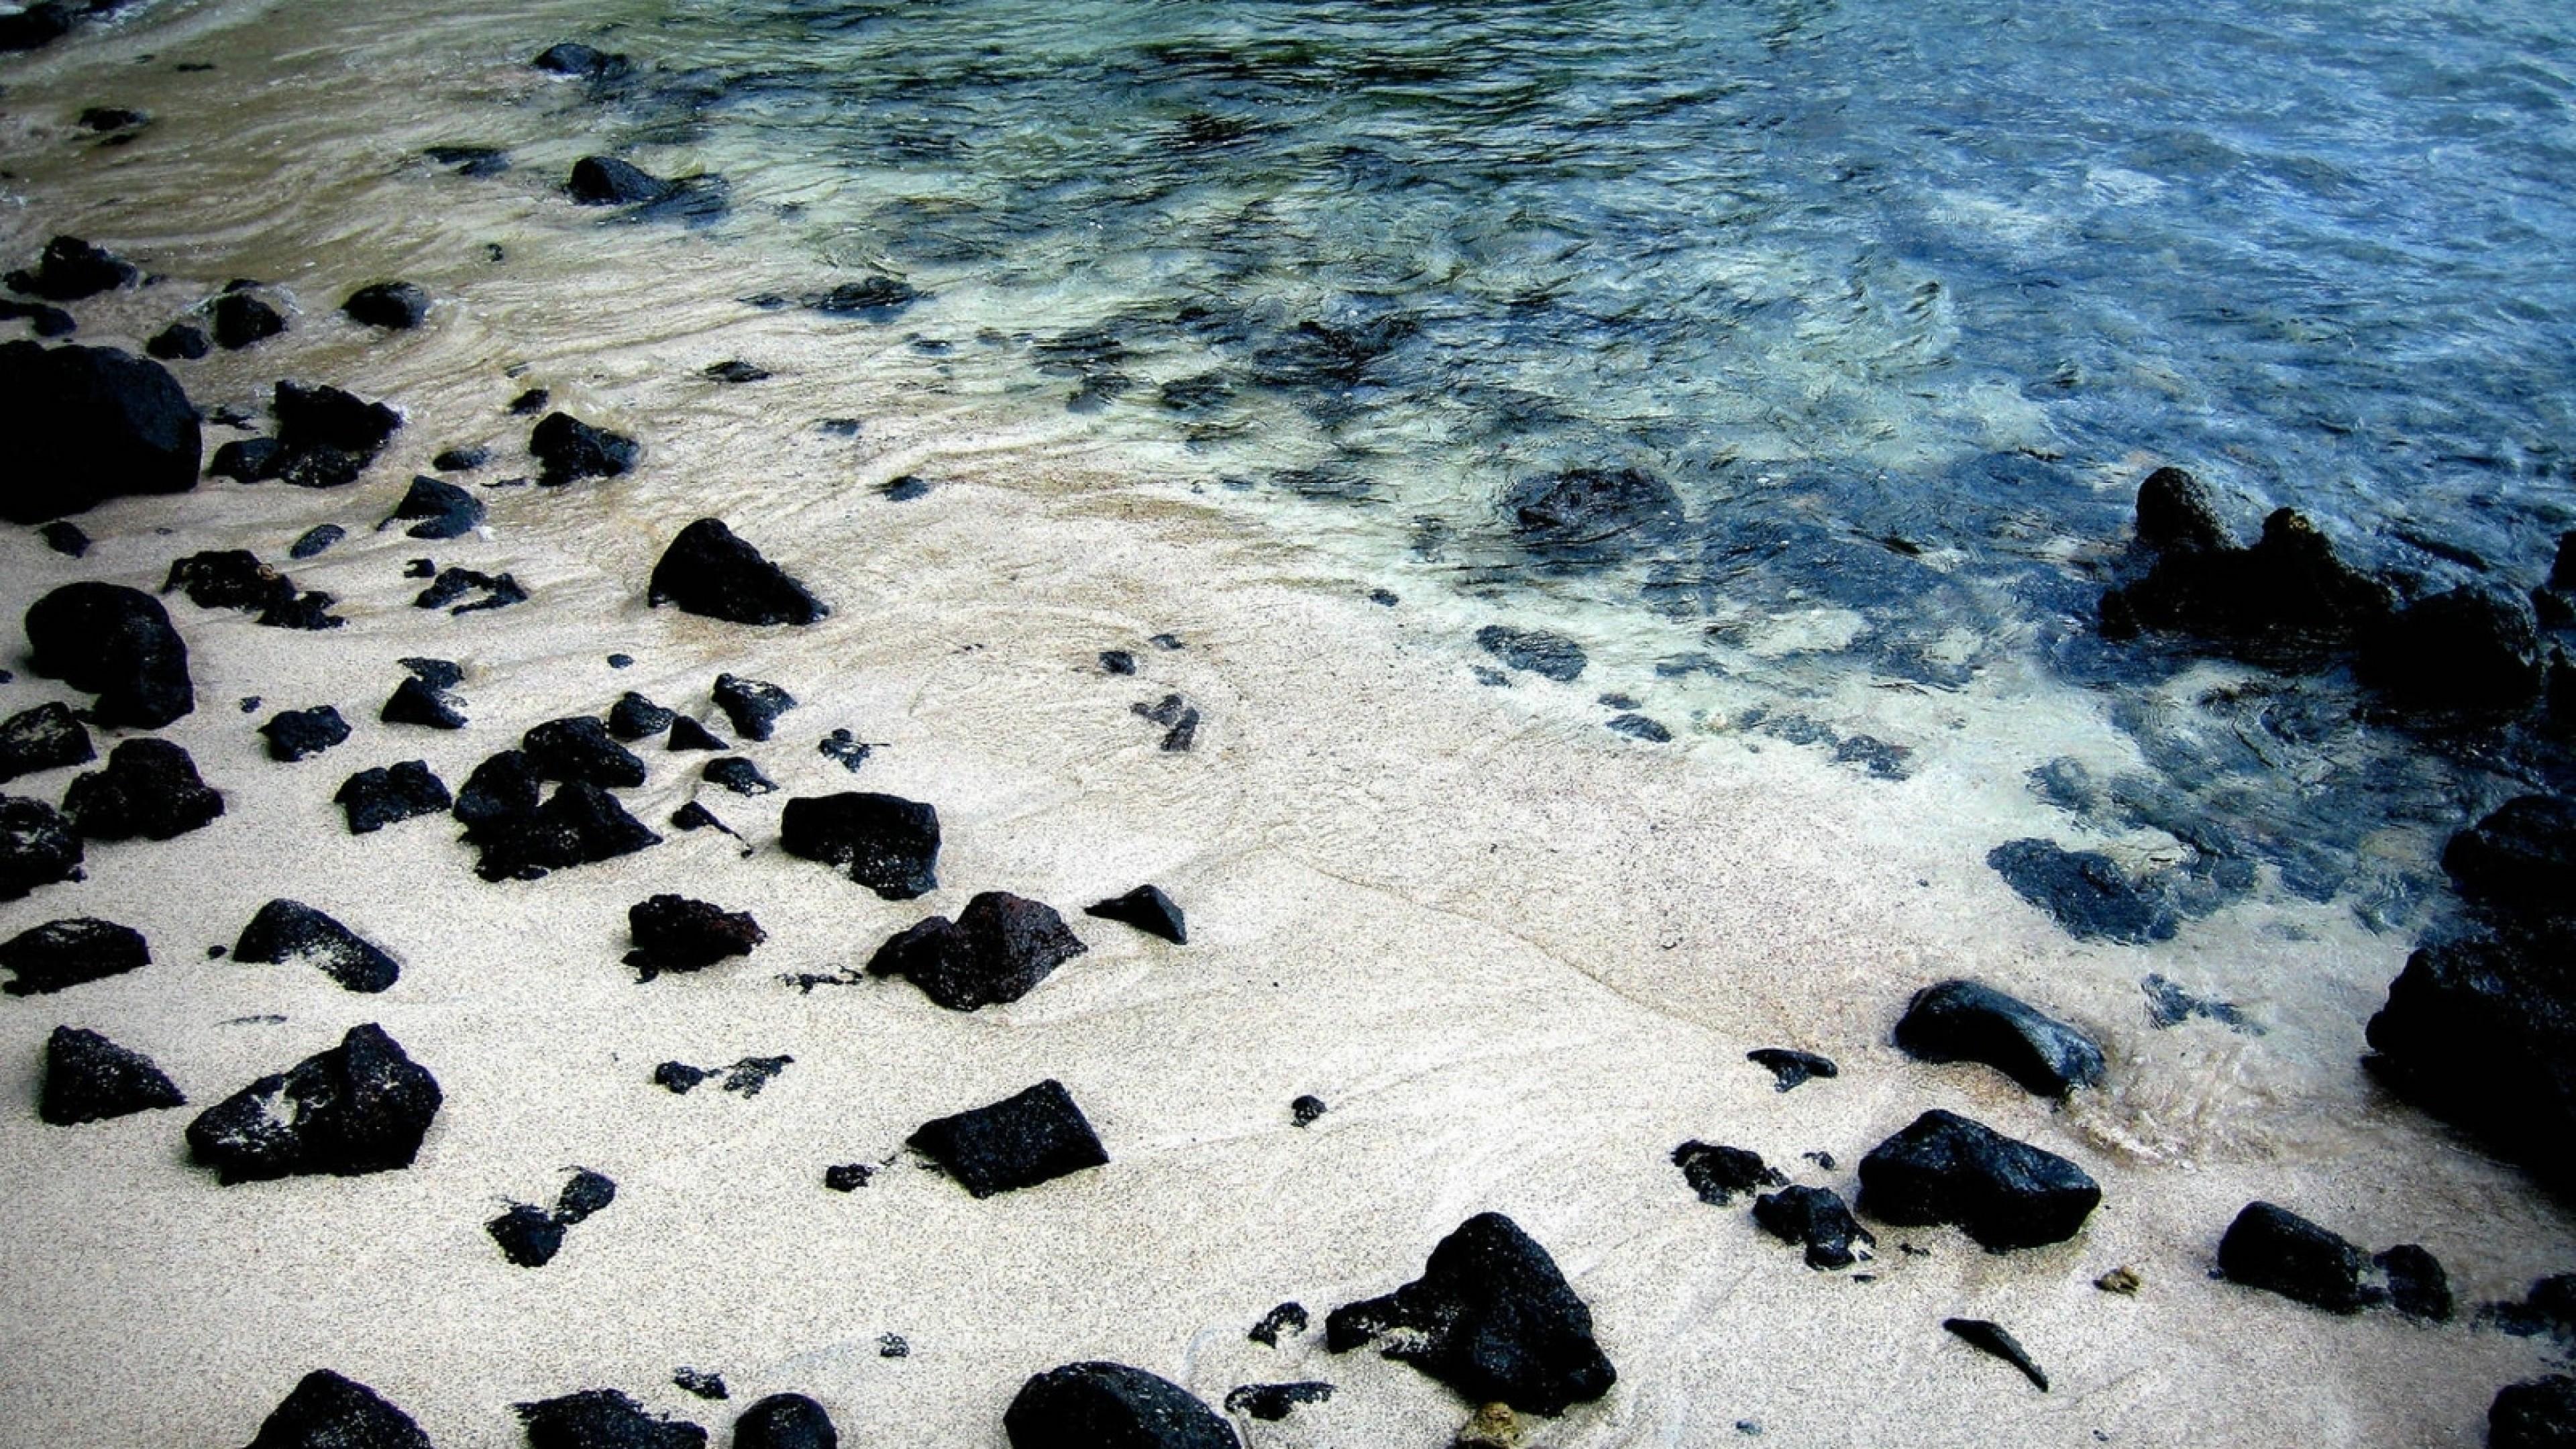 Black Rocks On White Sand Beach Hd Wallpaper 4k Ultra Hd Hd